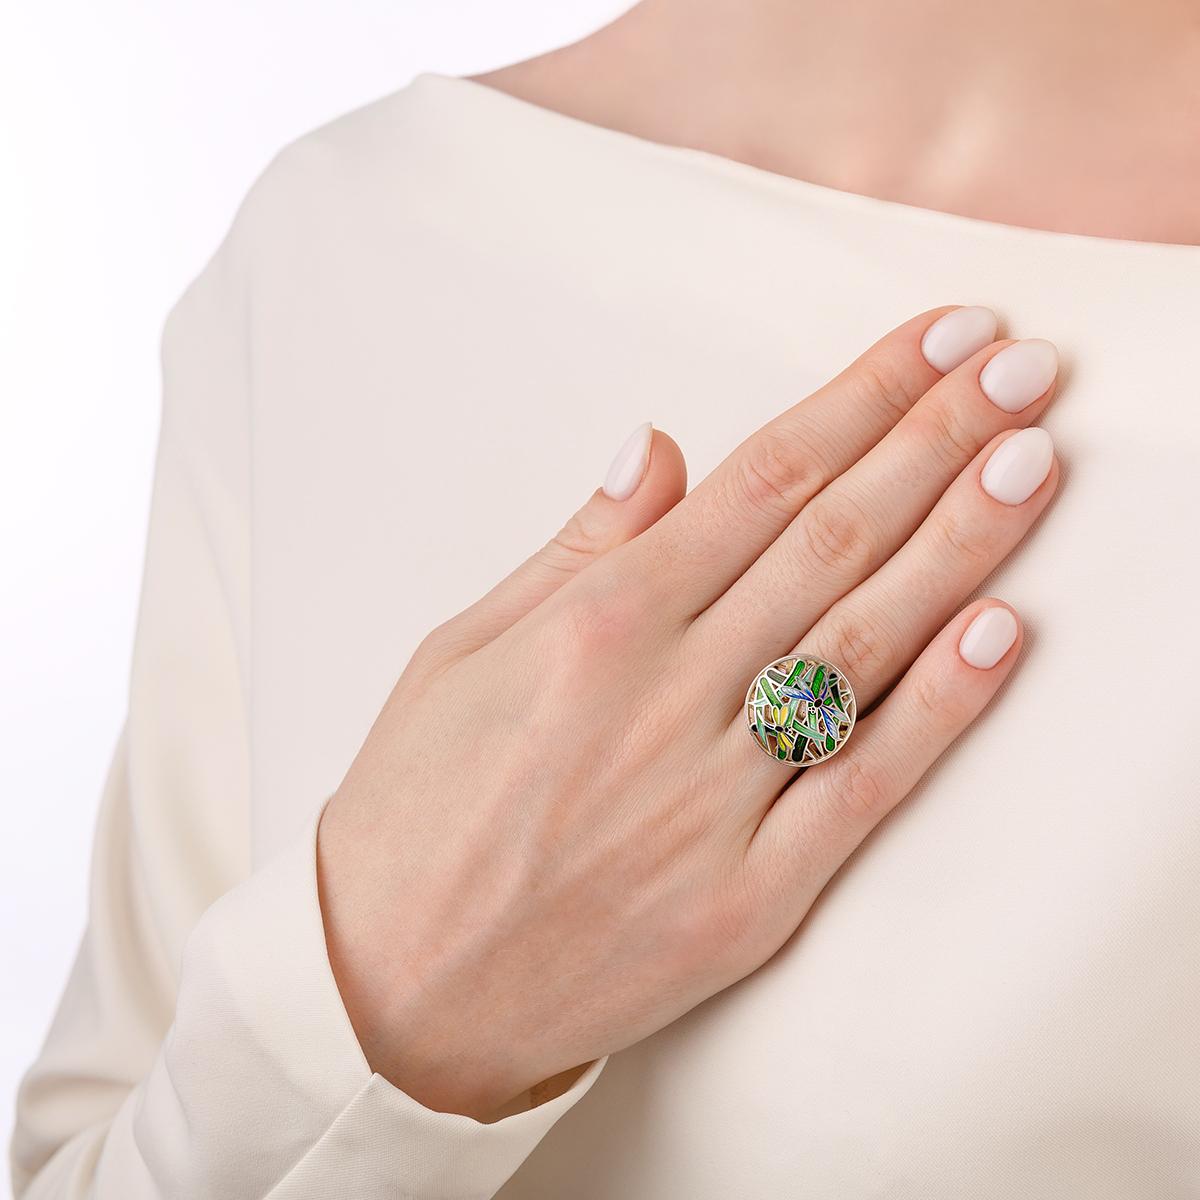 kolczo strekozy 61.214 - Перстень из серебра «Стрекозы»